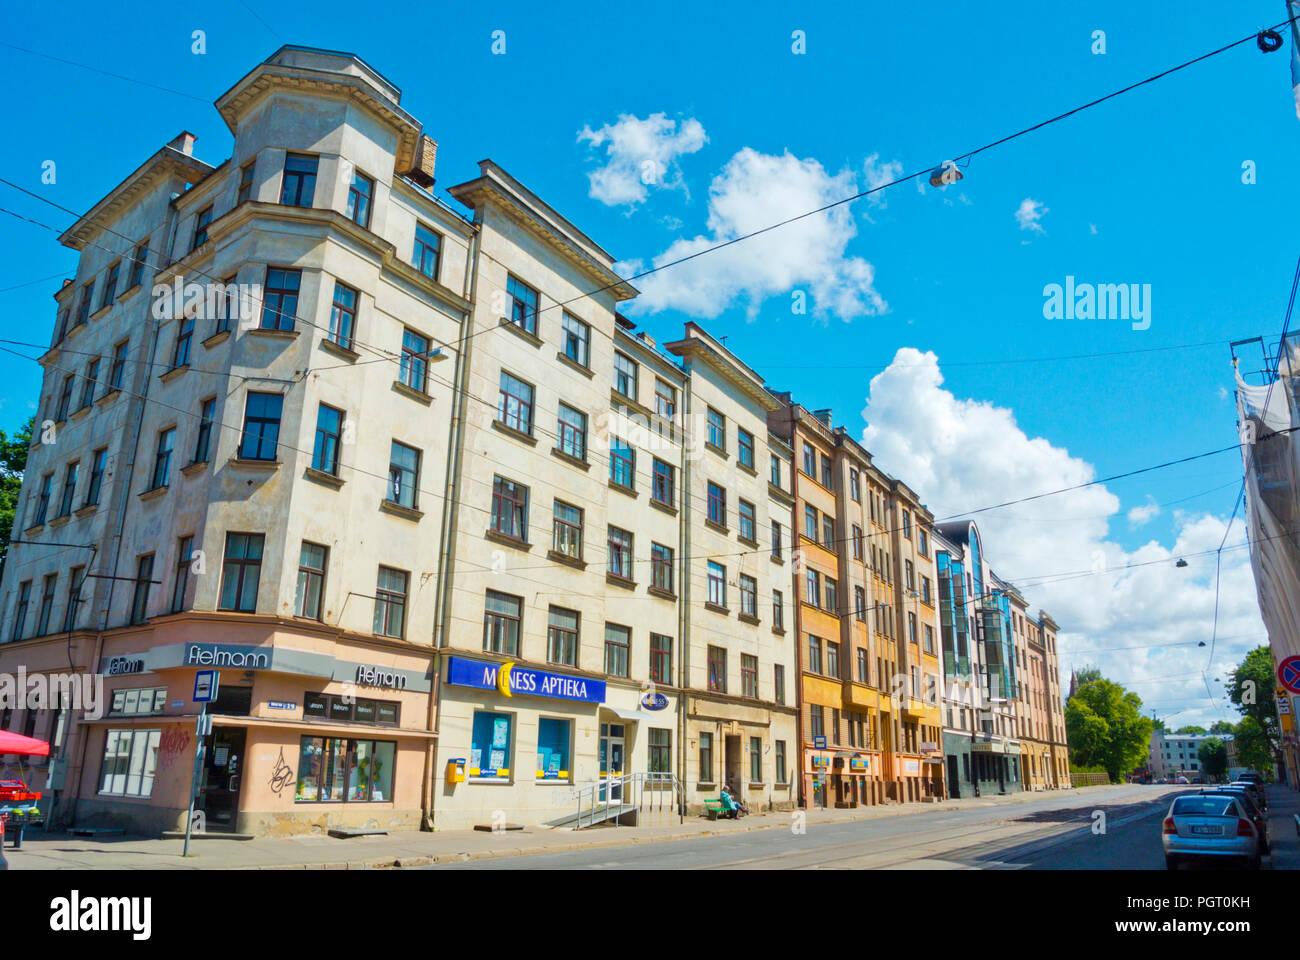 Slokas iela, Kalnciema kvartals, Riga, Latvia - Stock Image